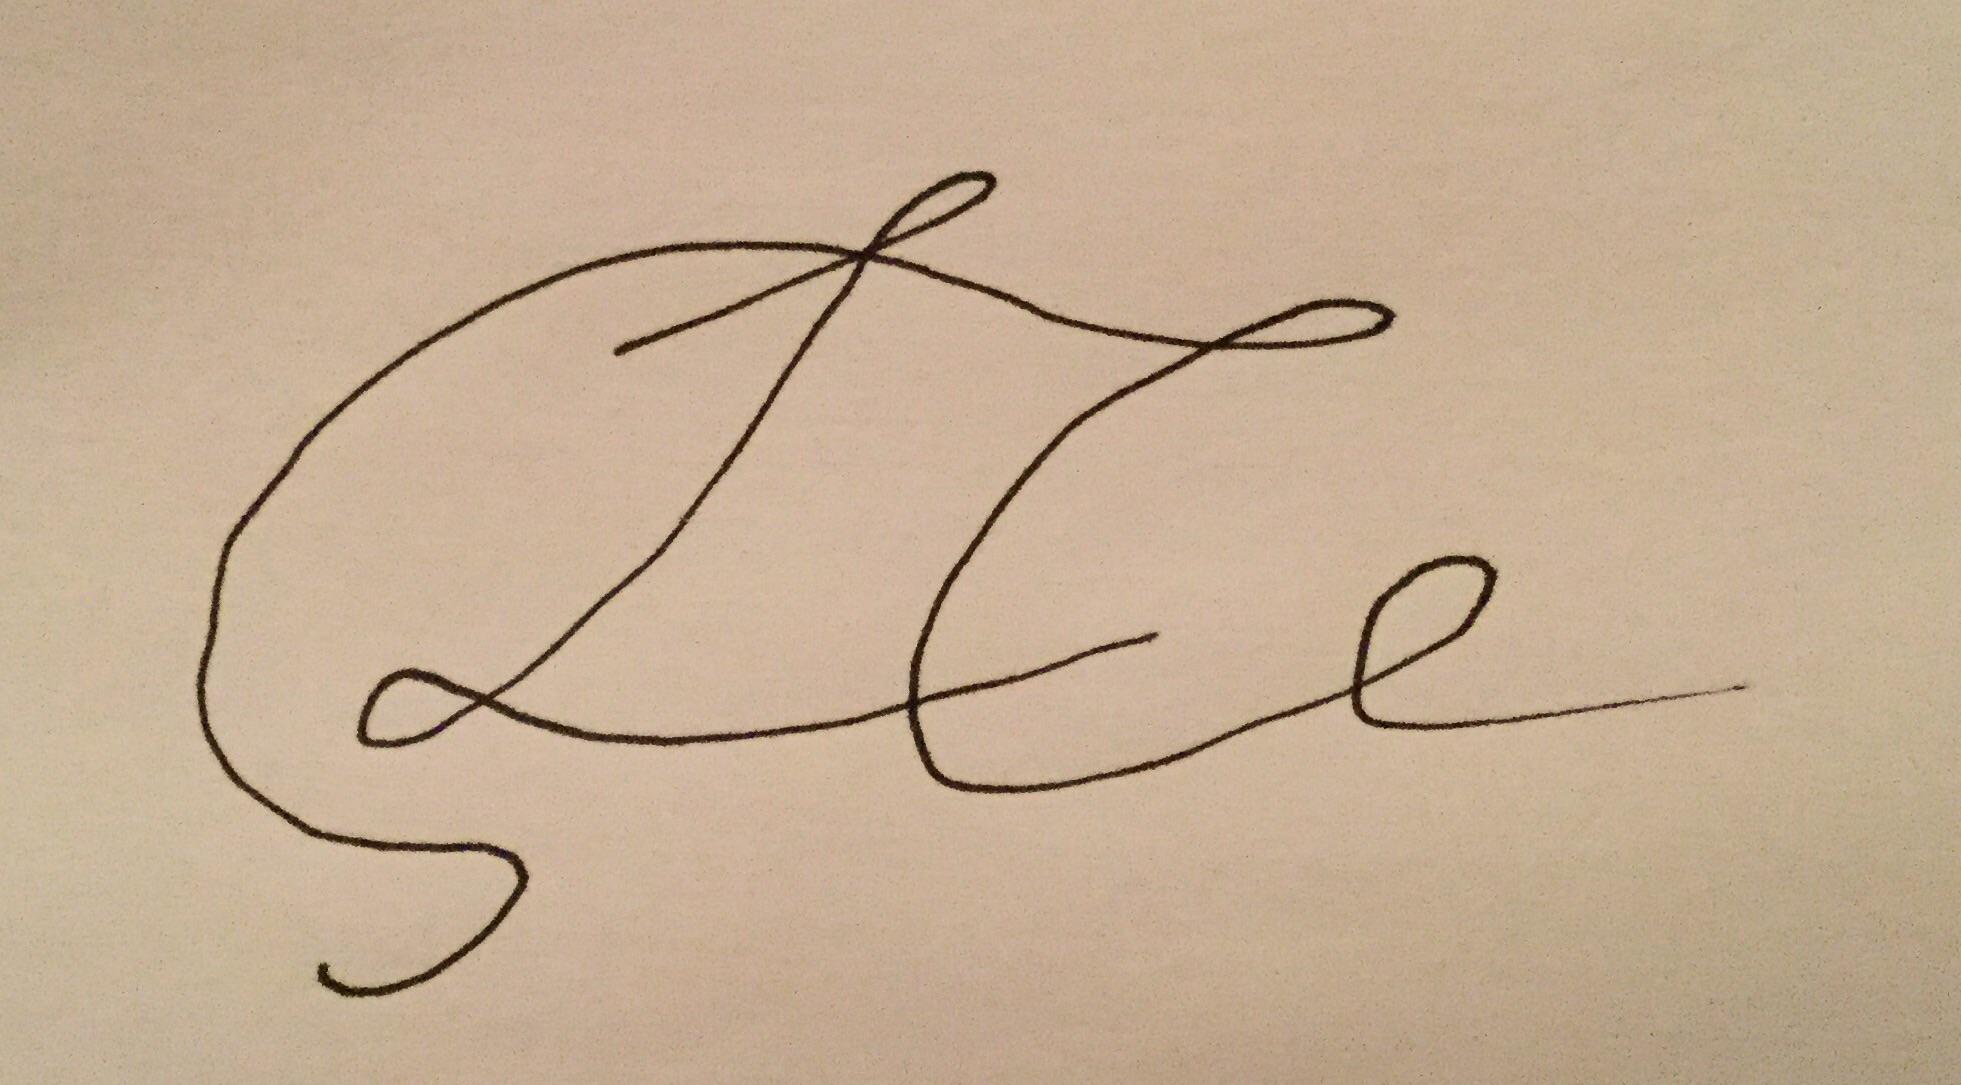 Lauren Collins's Signature